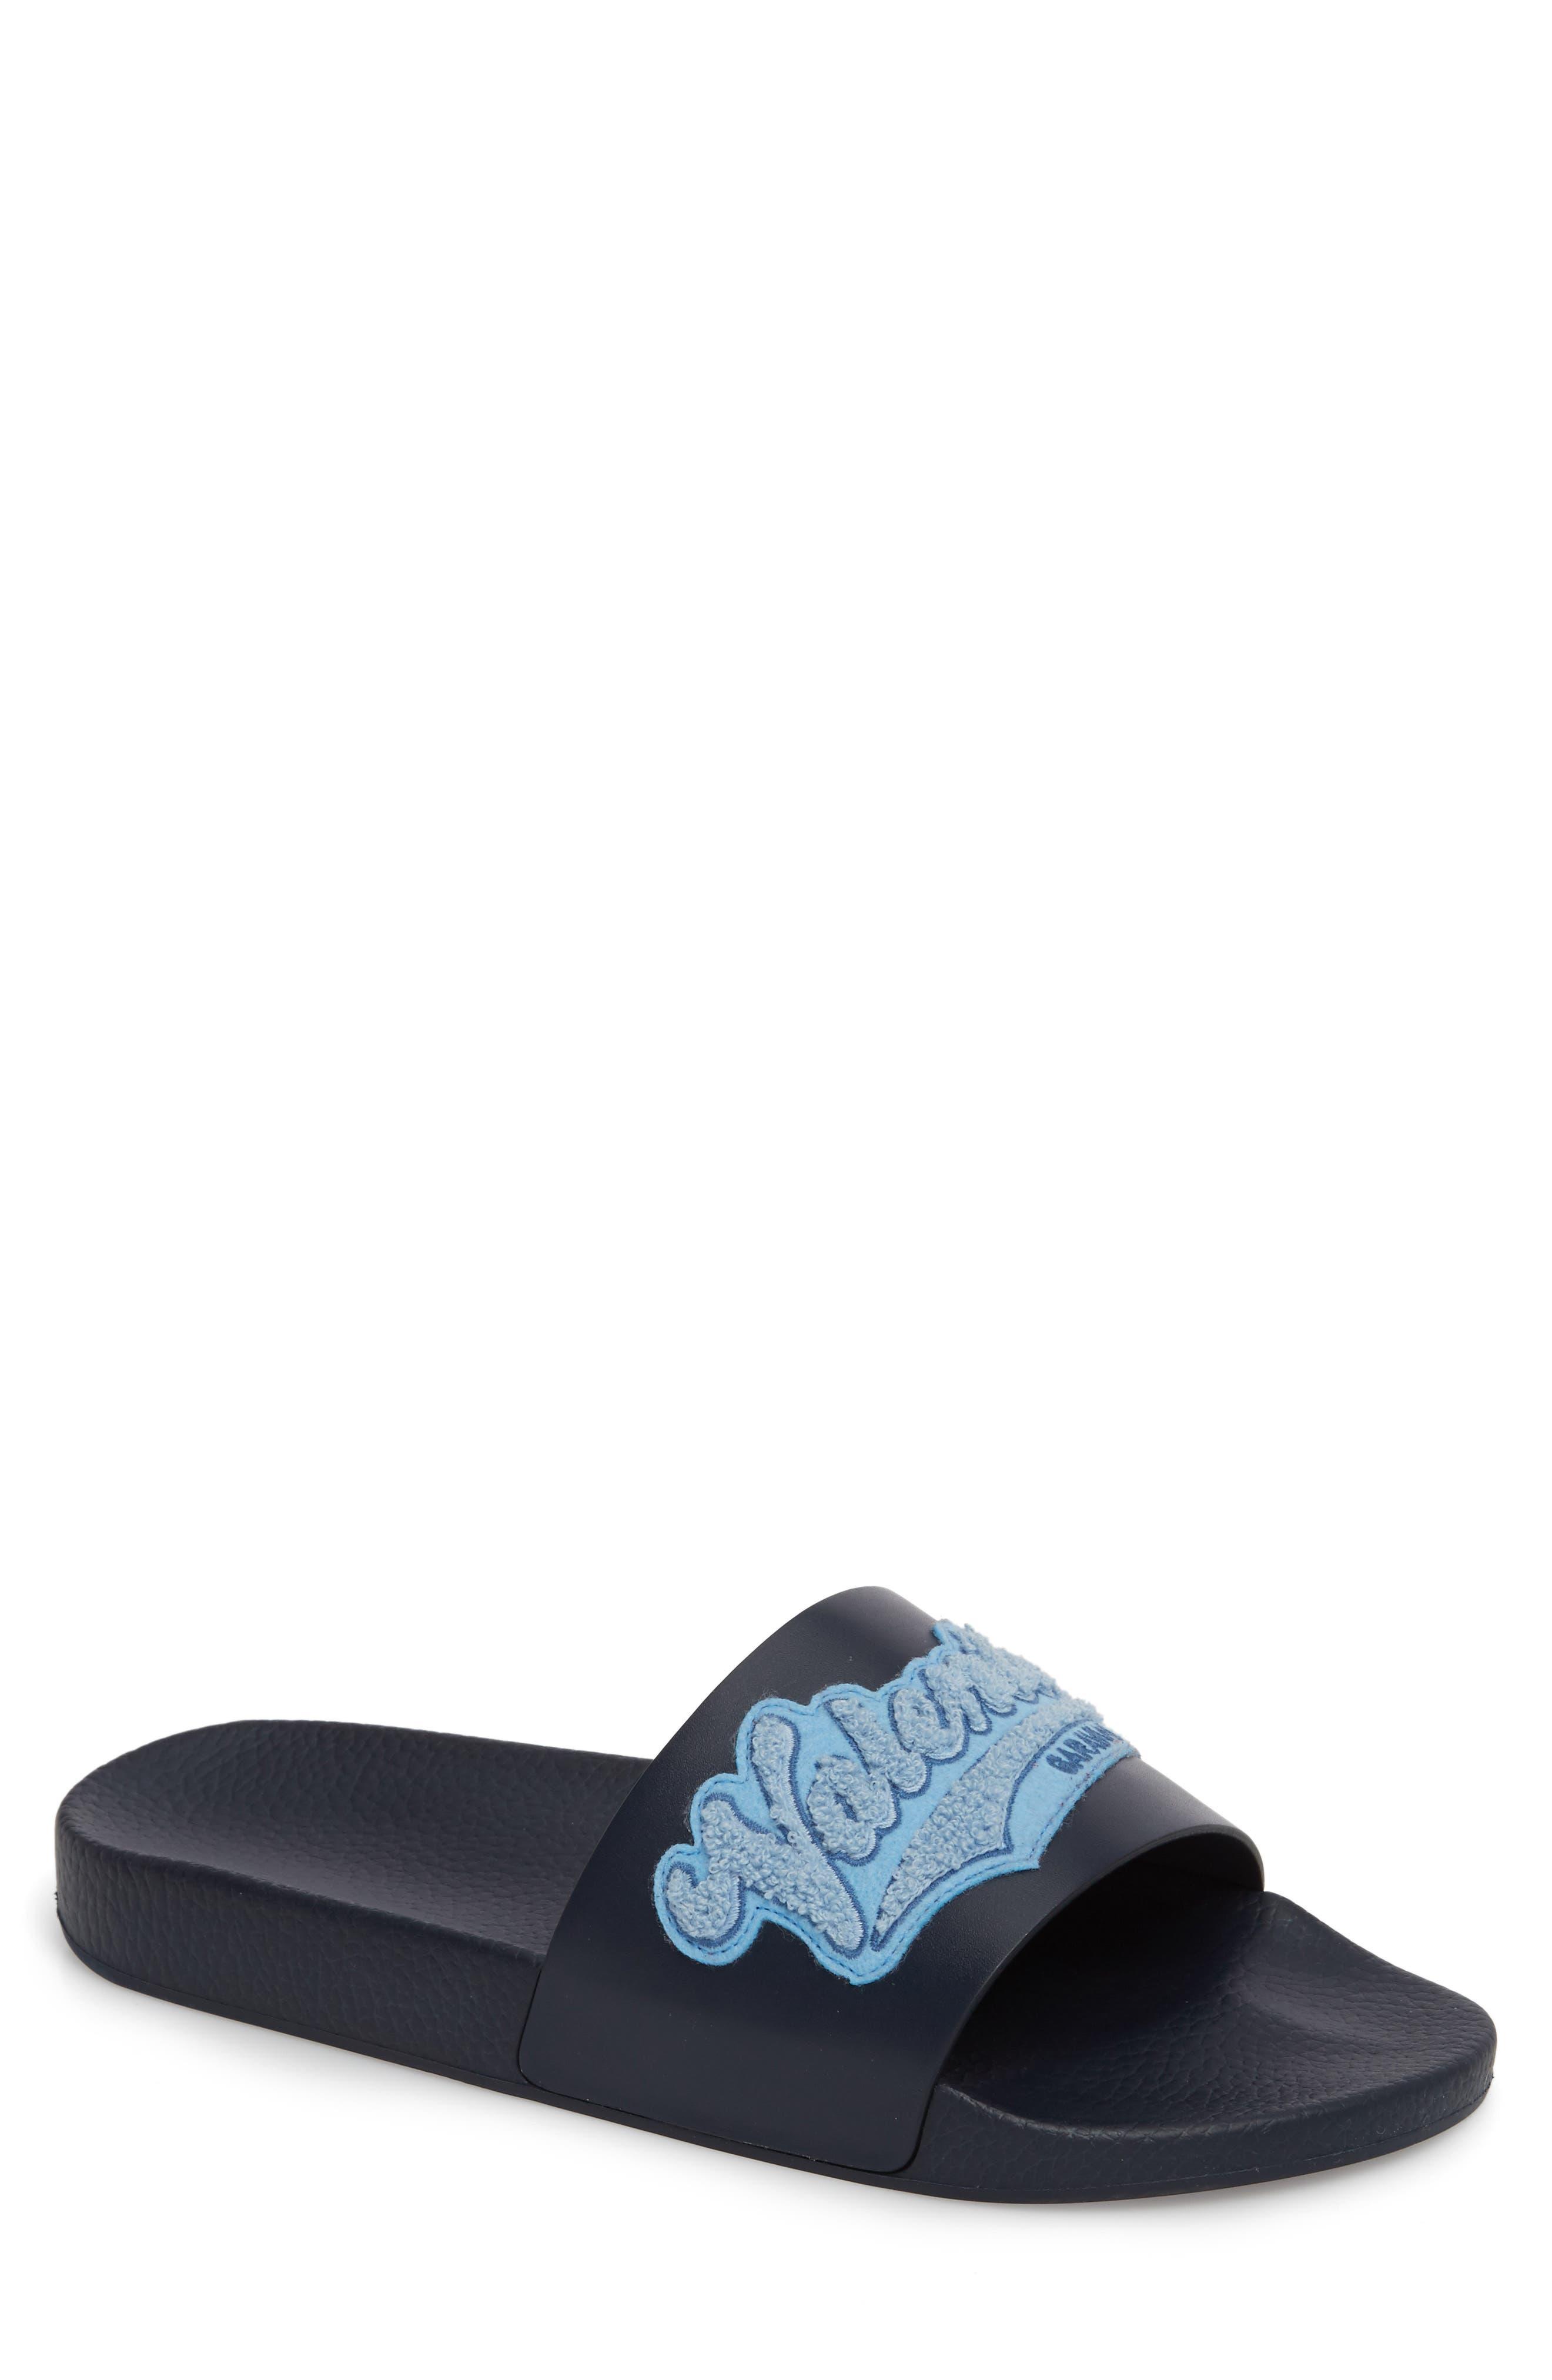 Slide Sandal,                         Main,                         color, 017